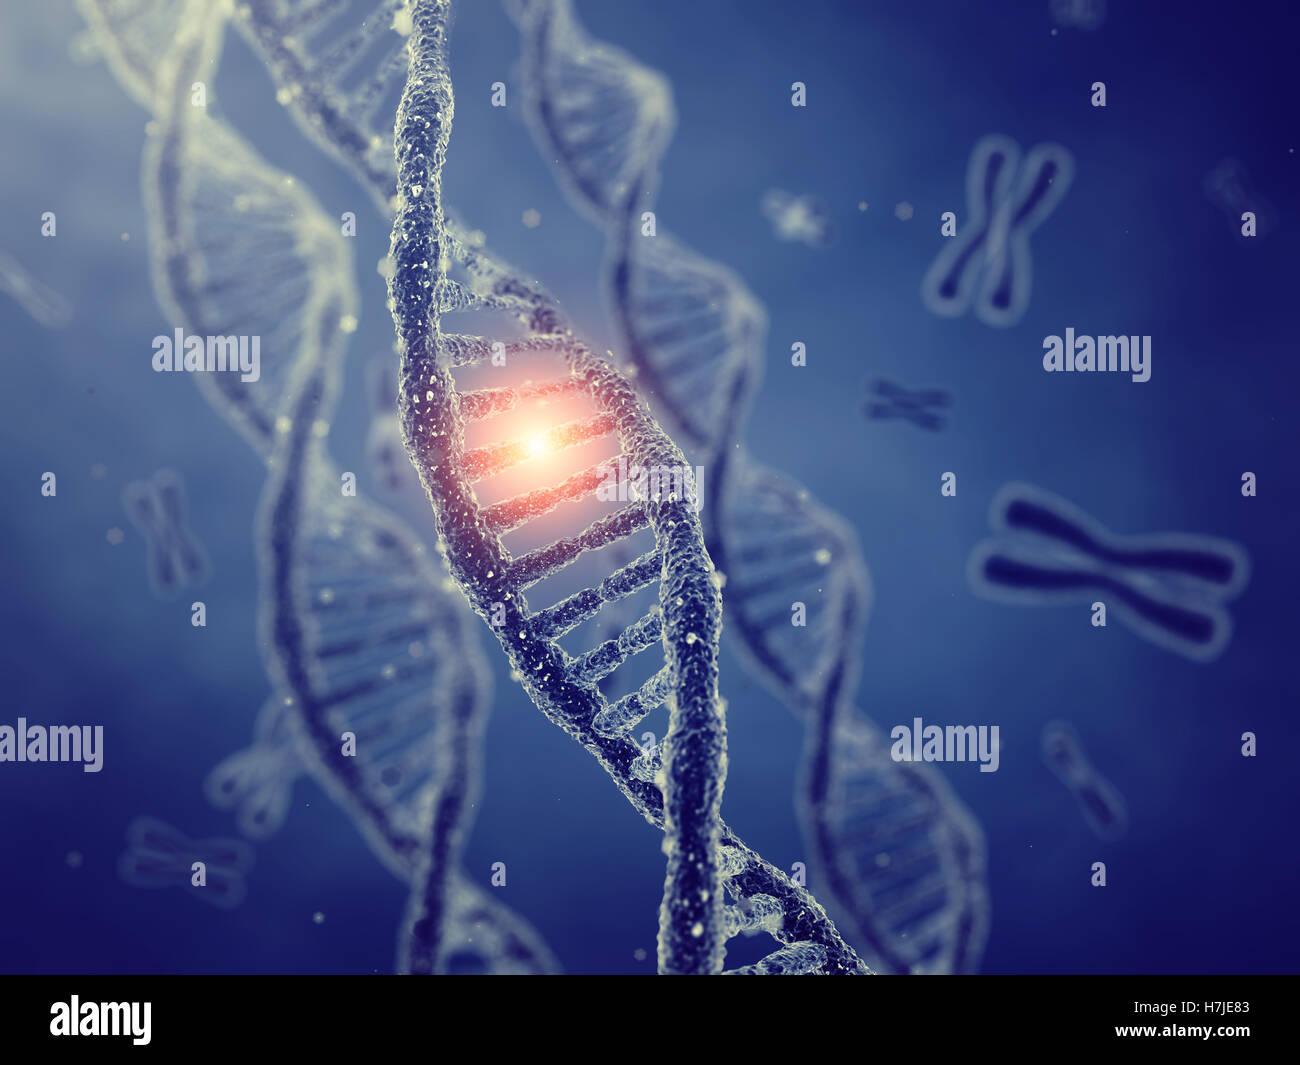 Dna double helix molecules and chromosomes , Gene mutation , Genetic code - Stock Image